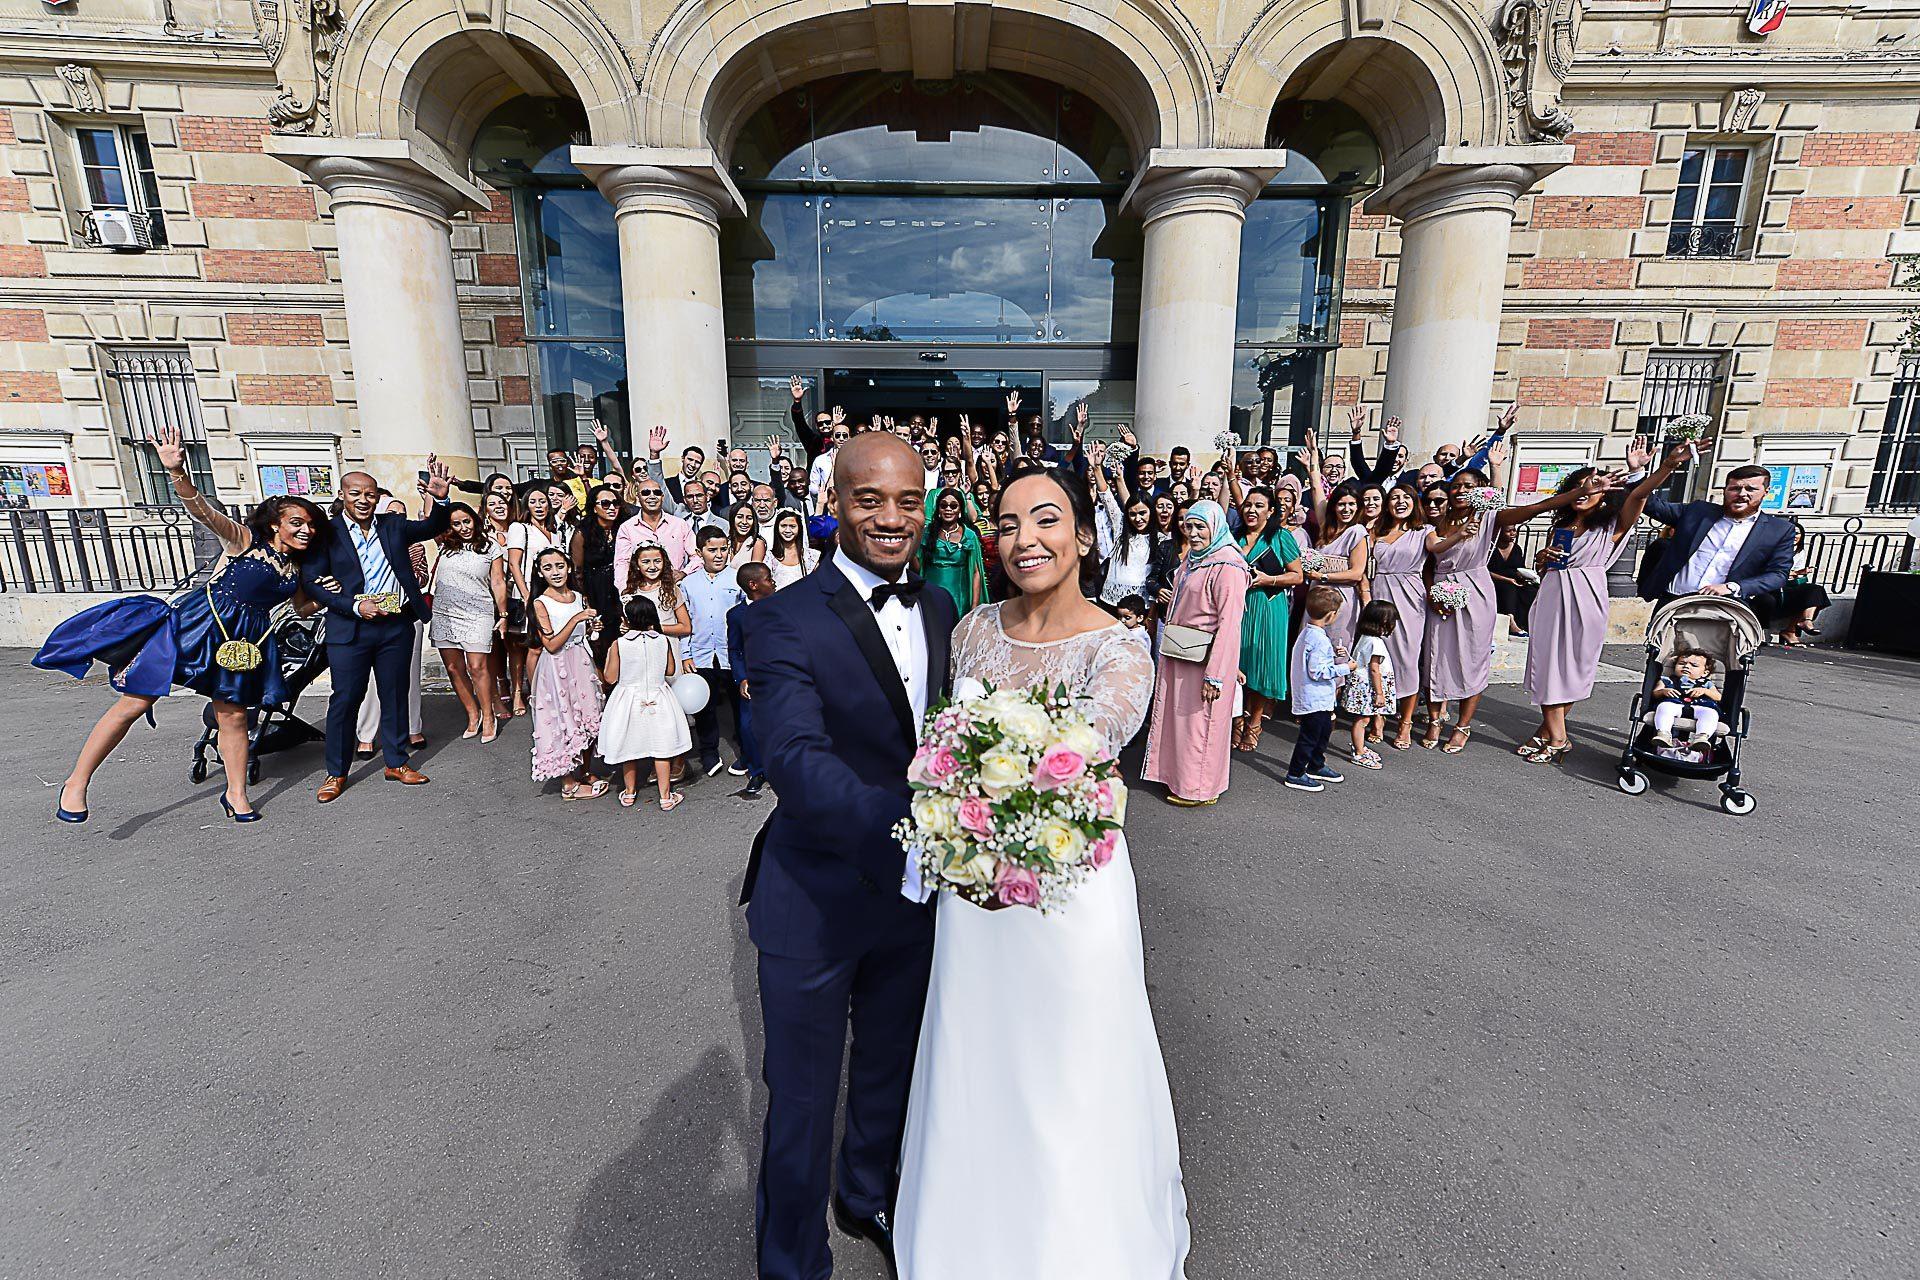 photographe-mariage-paris-portraits-groupe-mairie